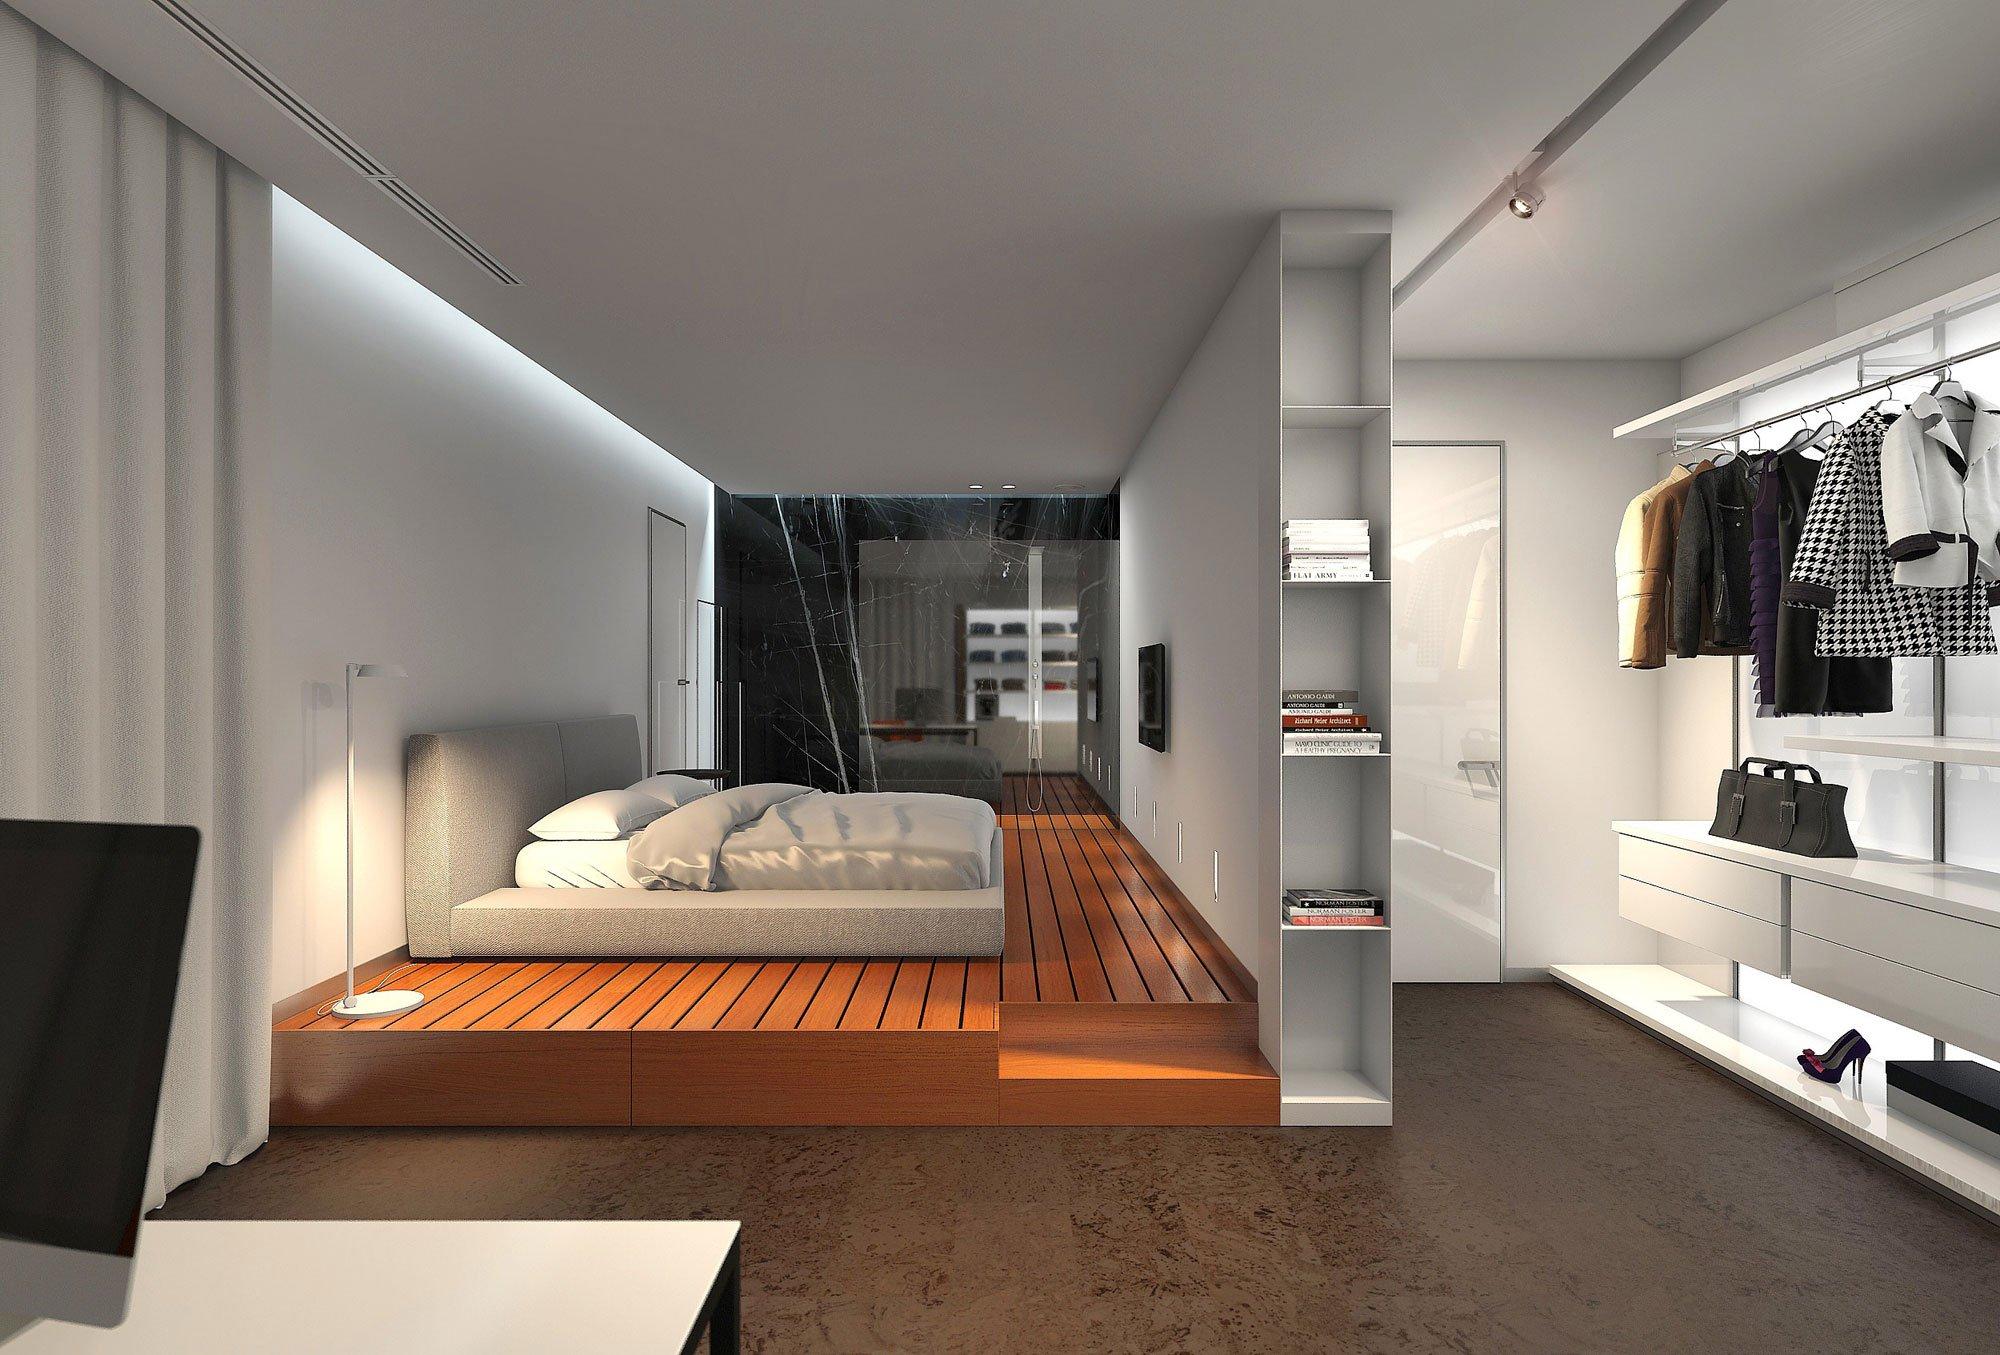 Disenos De Cuartos Modernos Of Plano De Departamento De Tres Dormitorios Construye Hogar